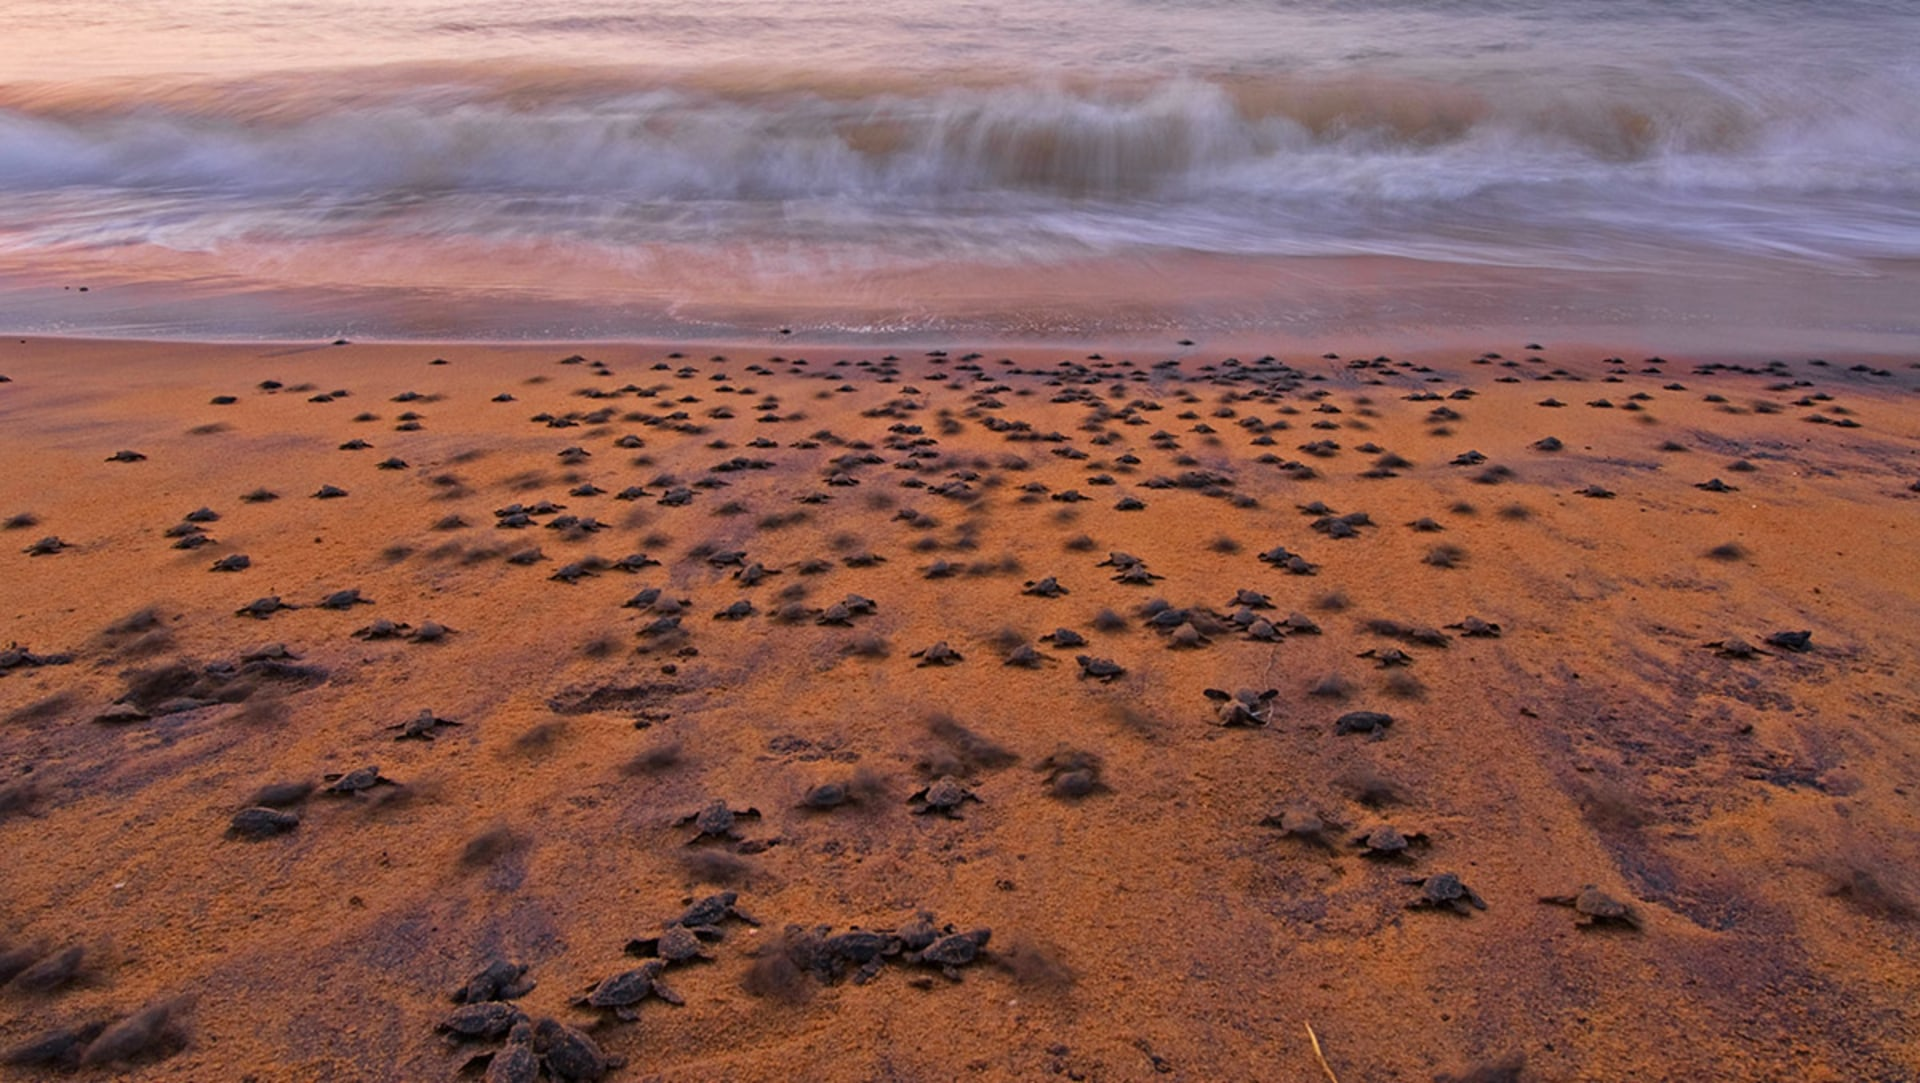 A half century of sea turtle conservation